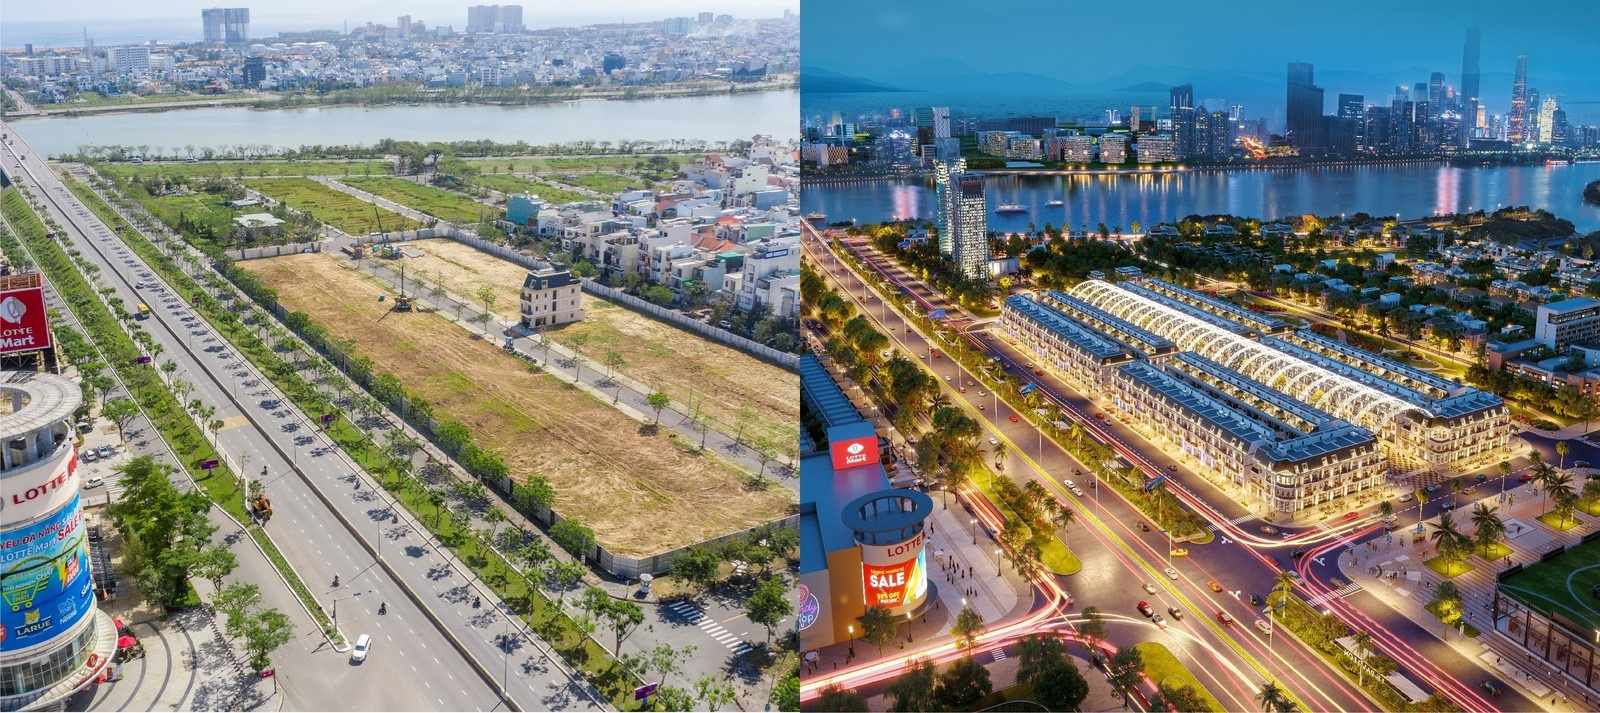 pho thuong mai regal pavillon don bay phat trien kinh te cho da nang